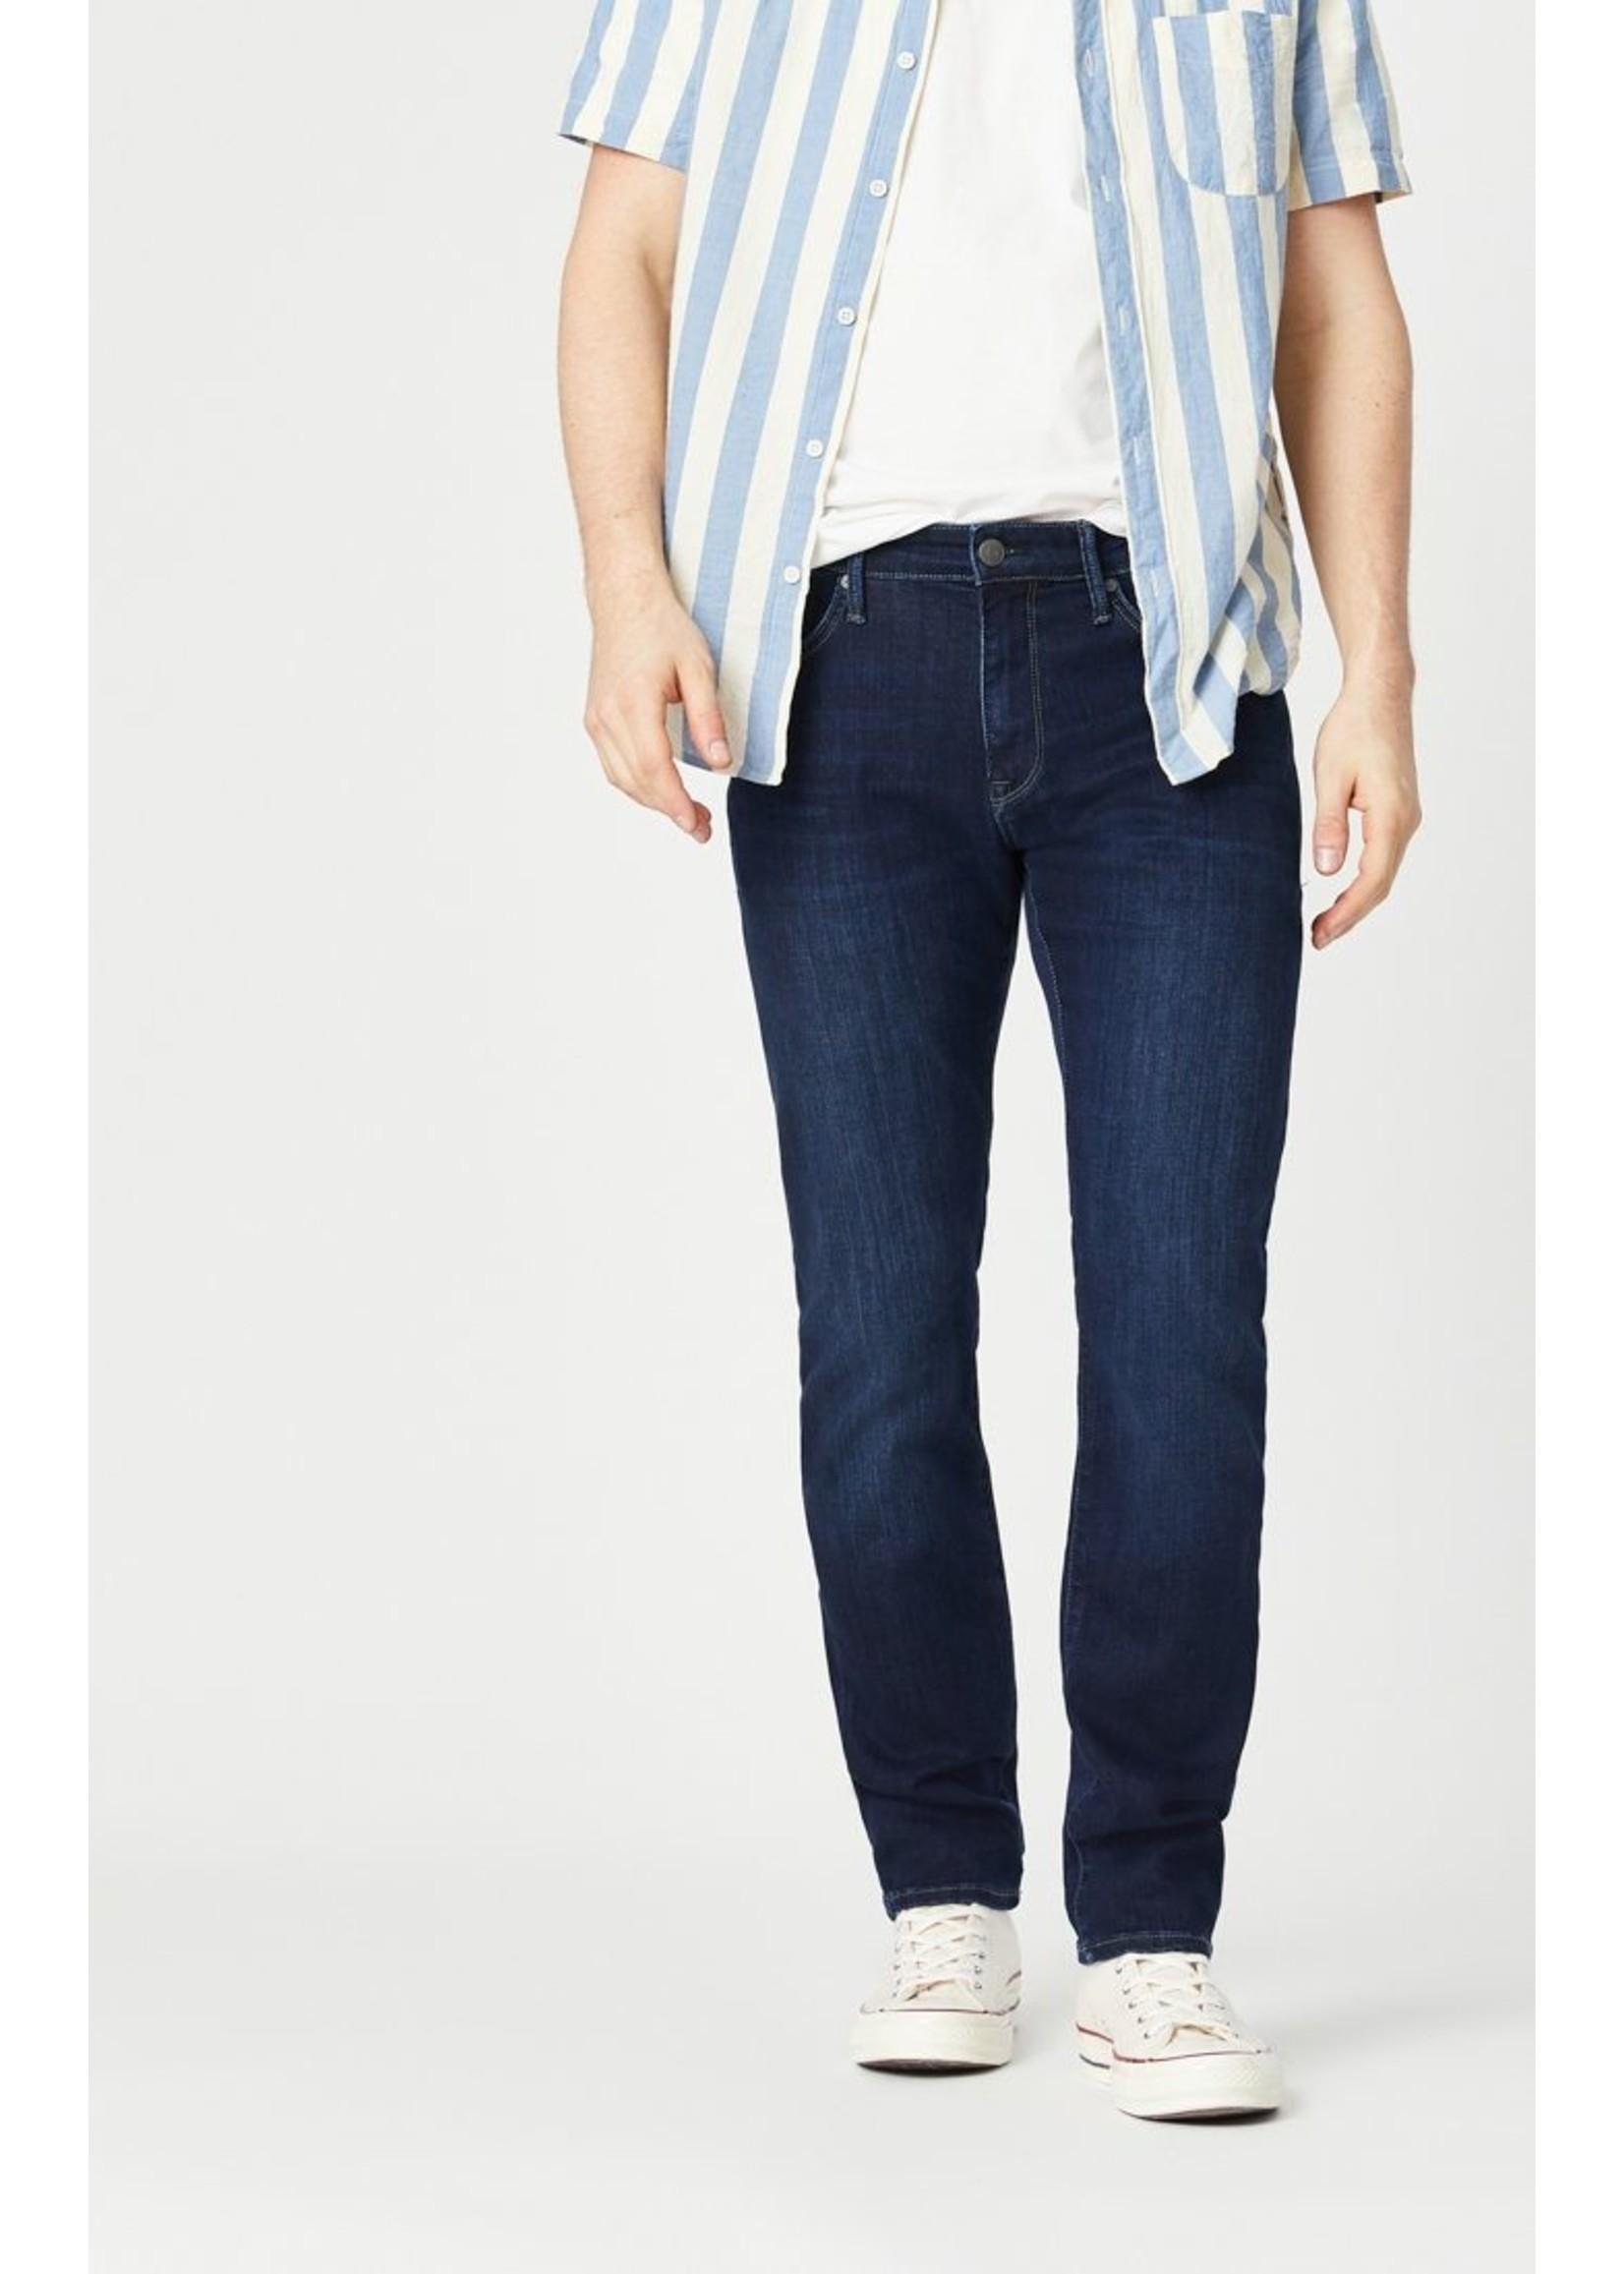 Mavi Jeans Jake Deep Blue Supermove